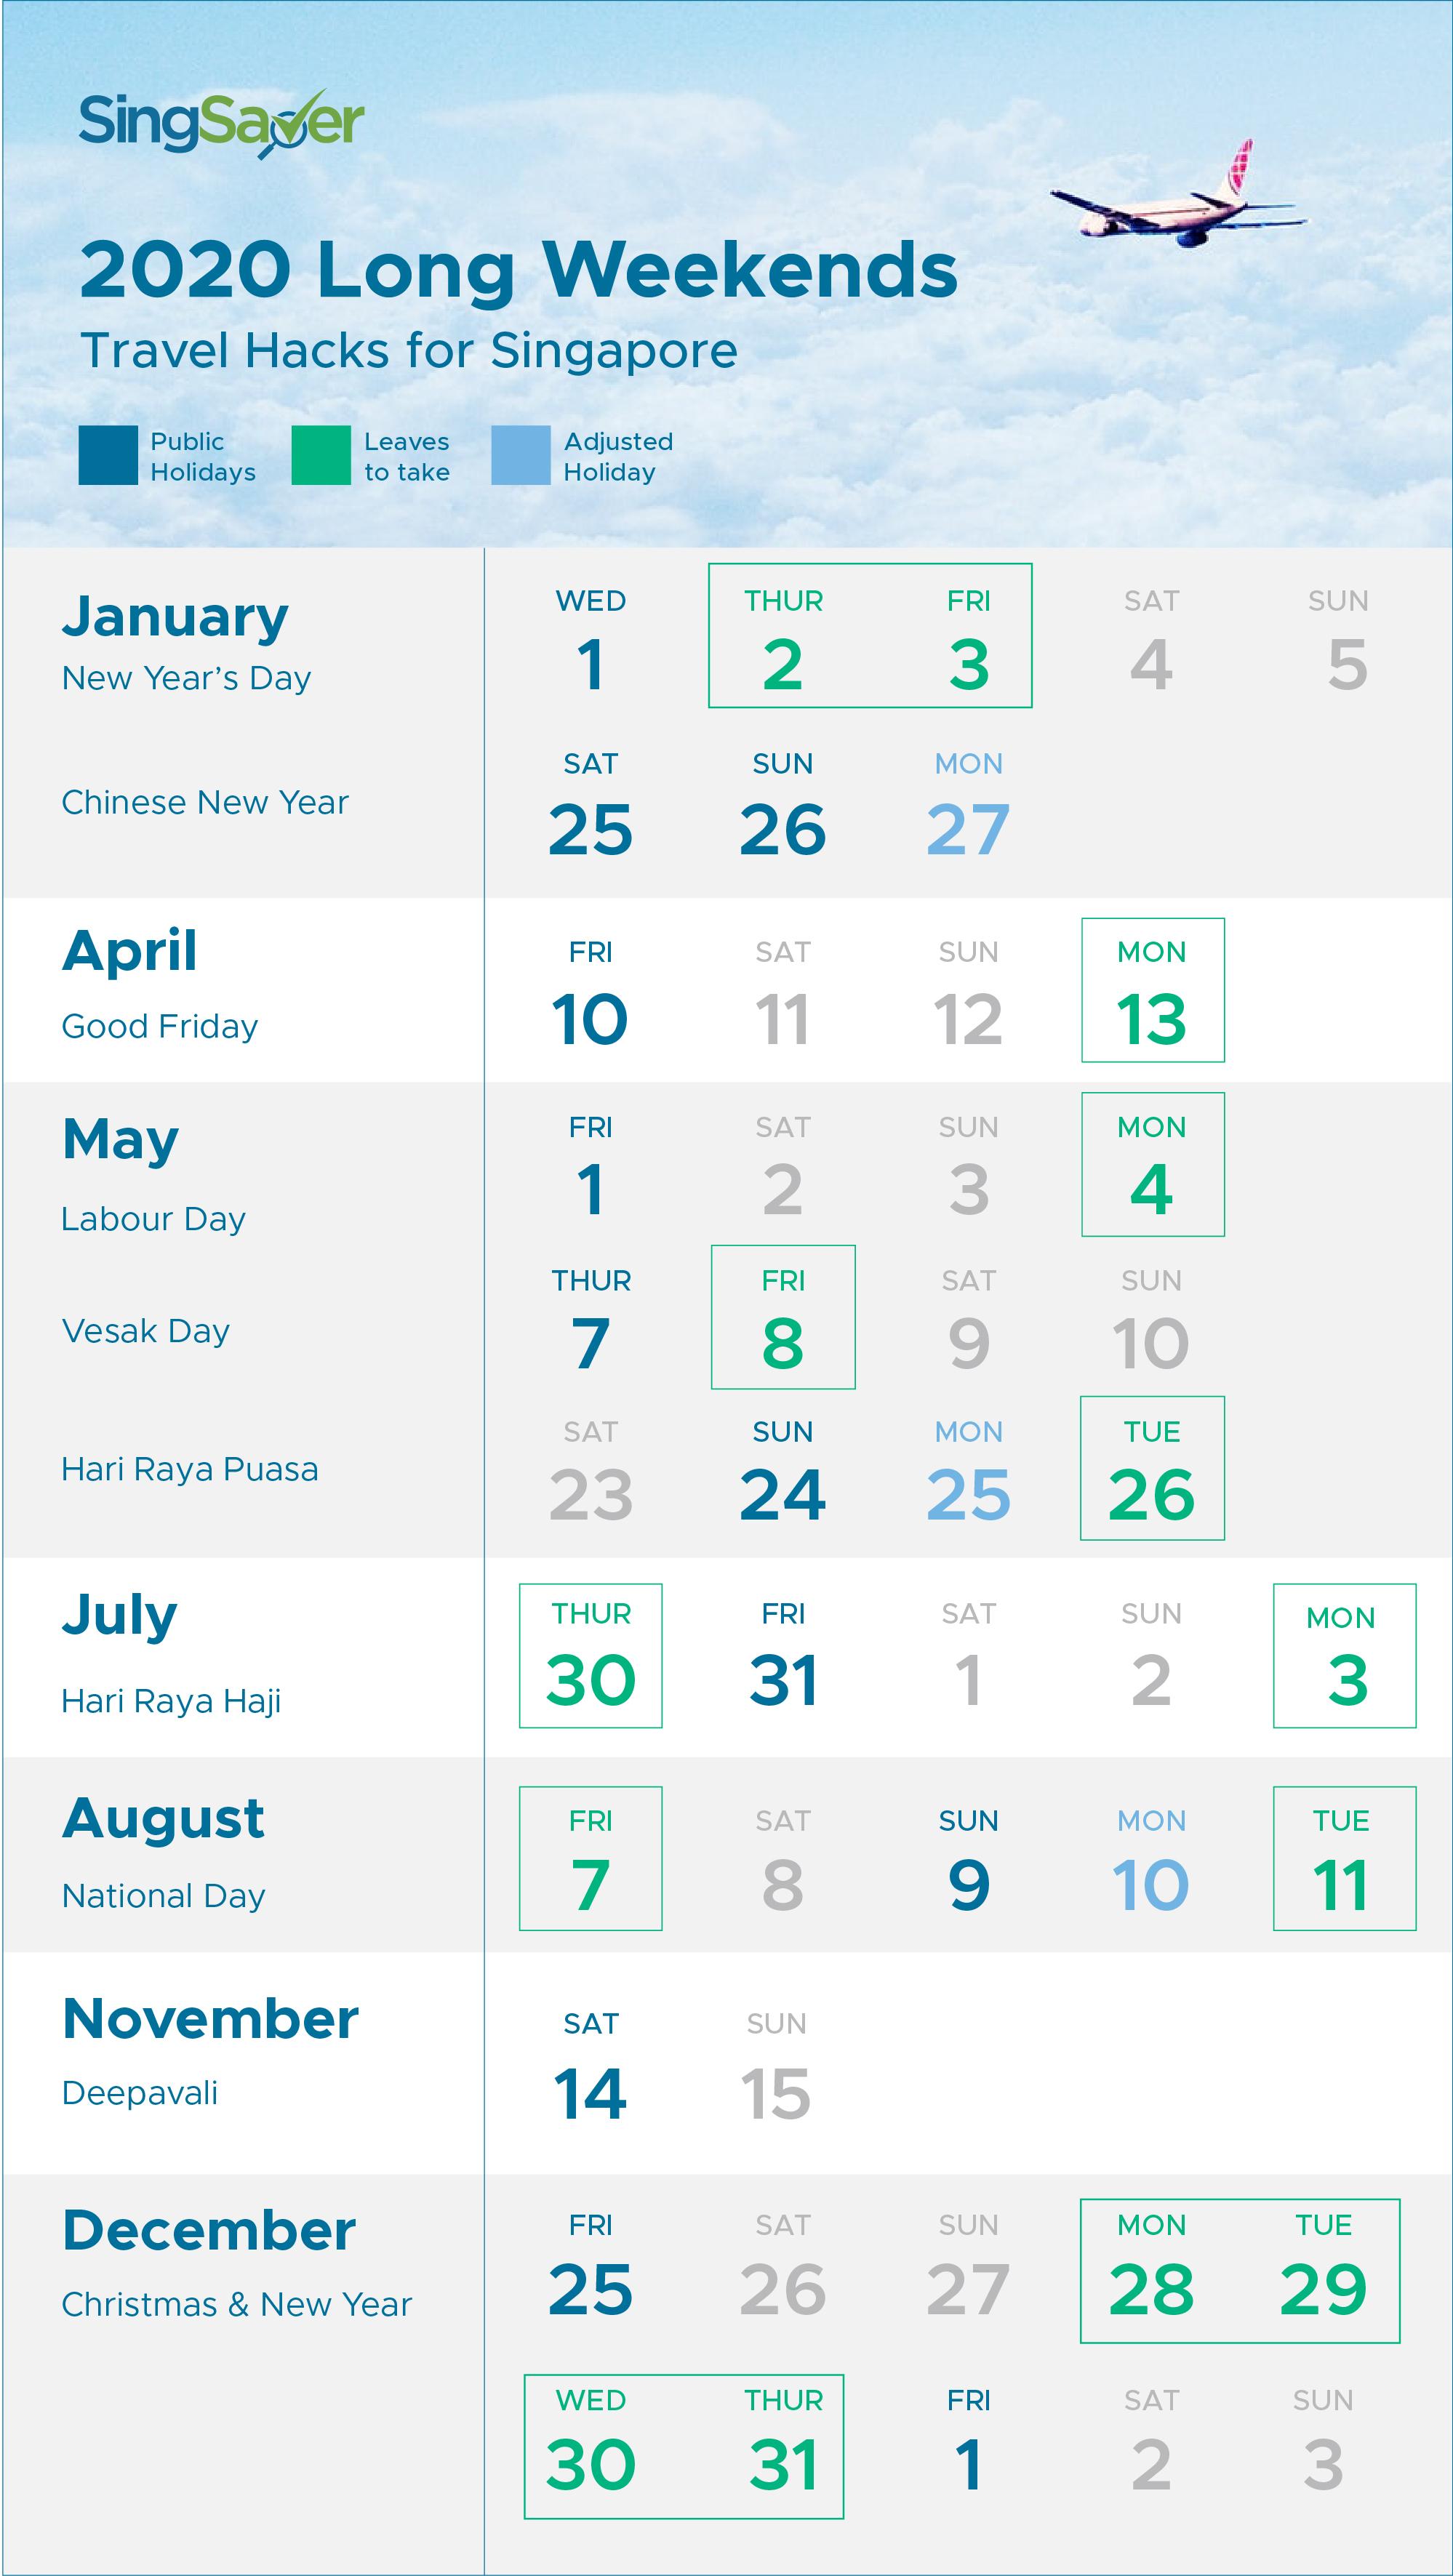 Public Holidays 2020 Long Weekends Singapore